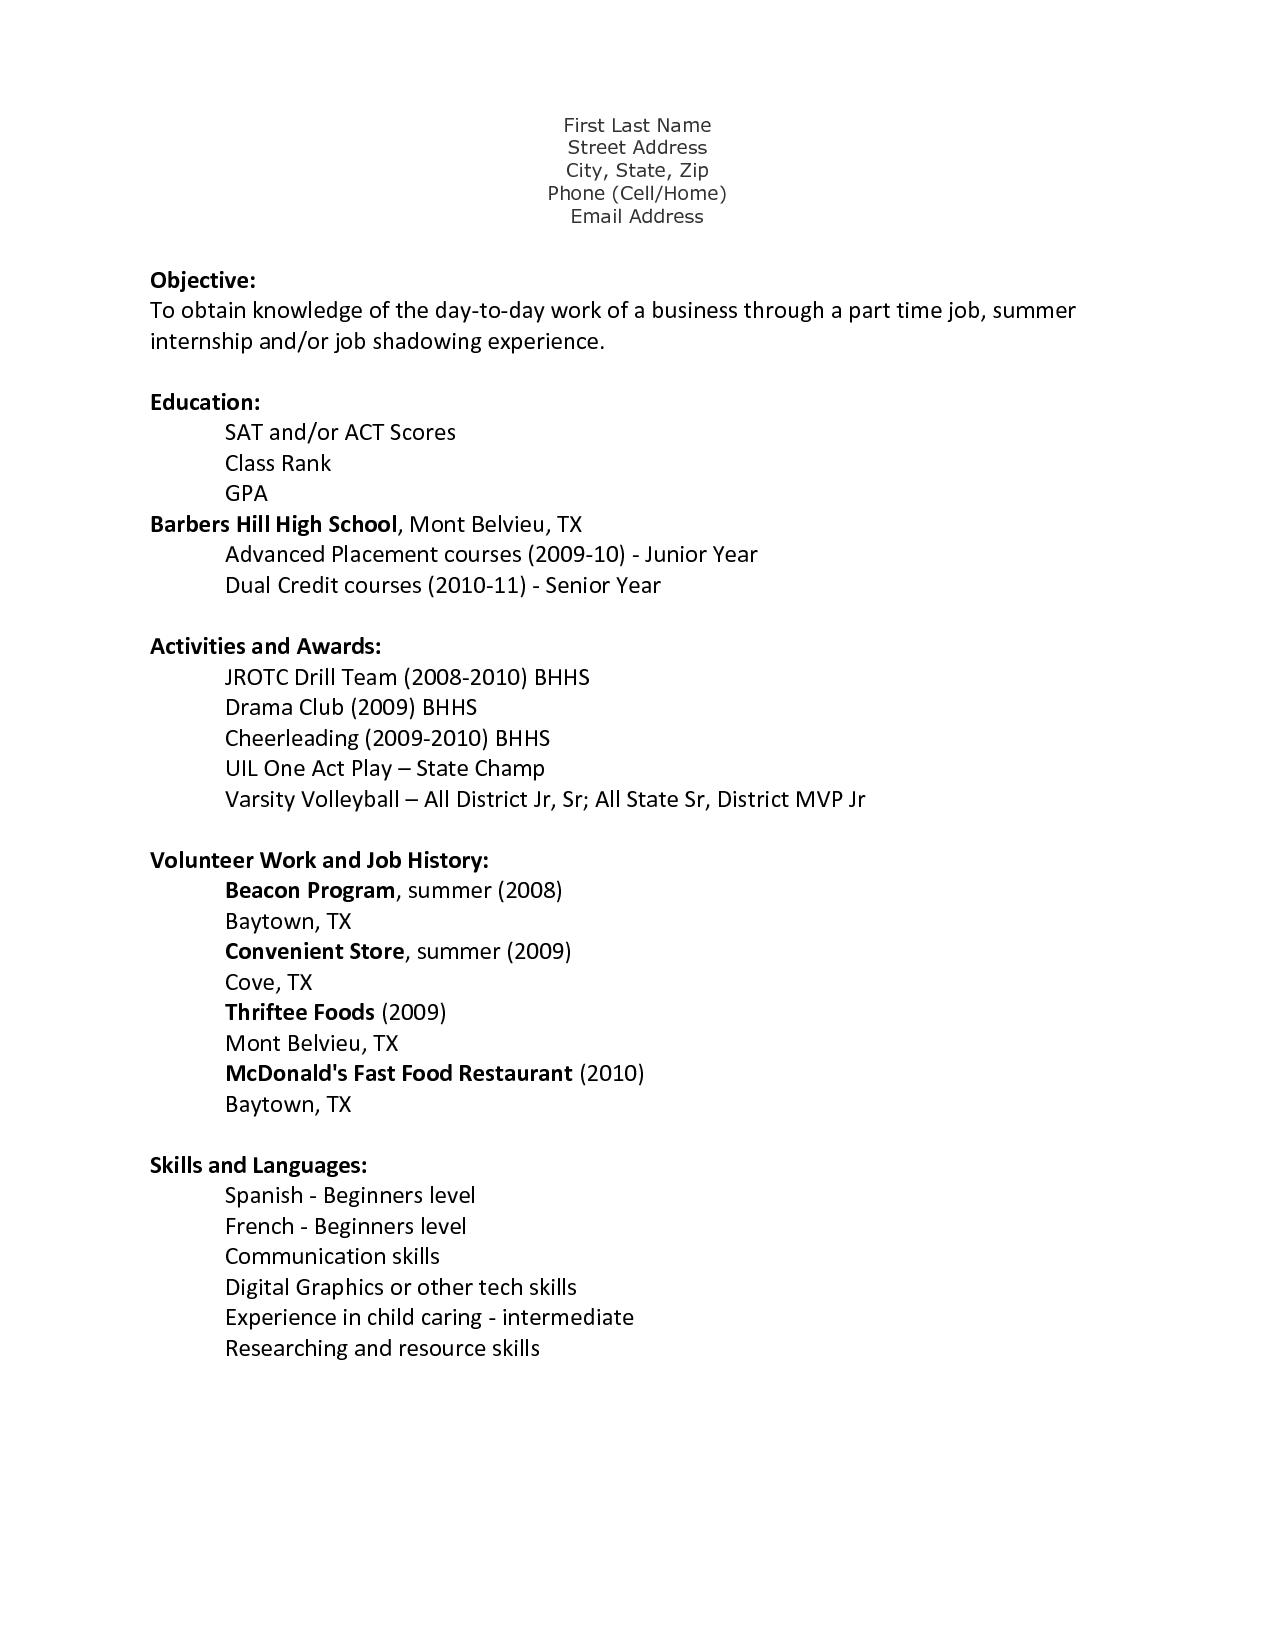 Teenage Resume Template | berathen.Com